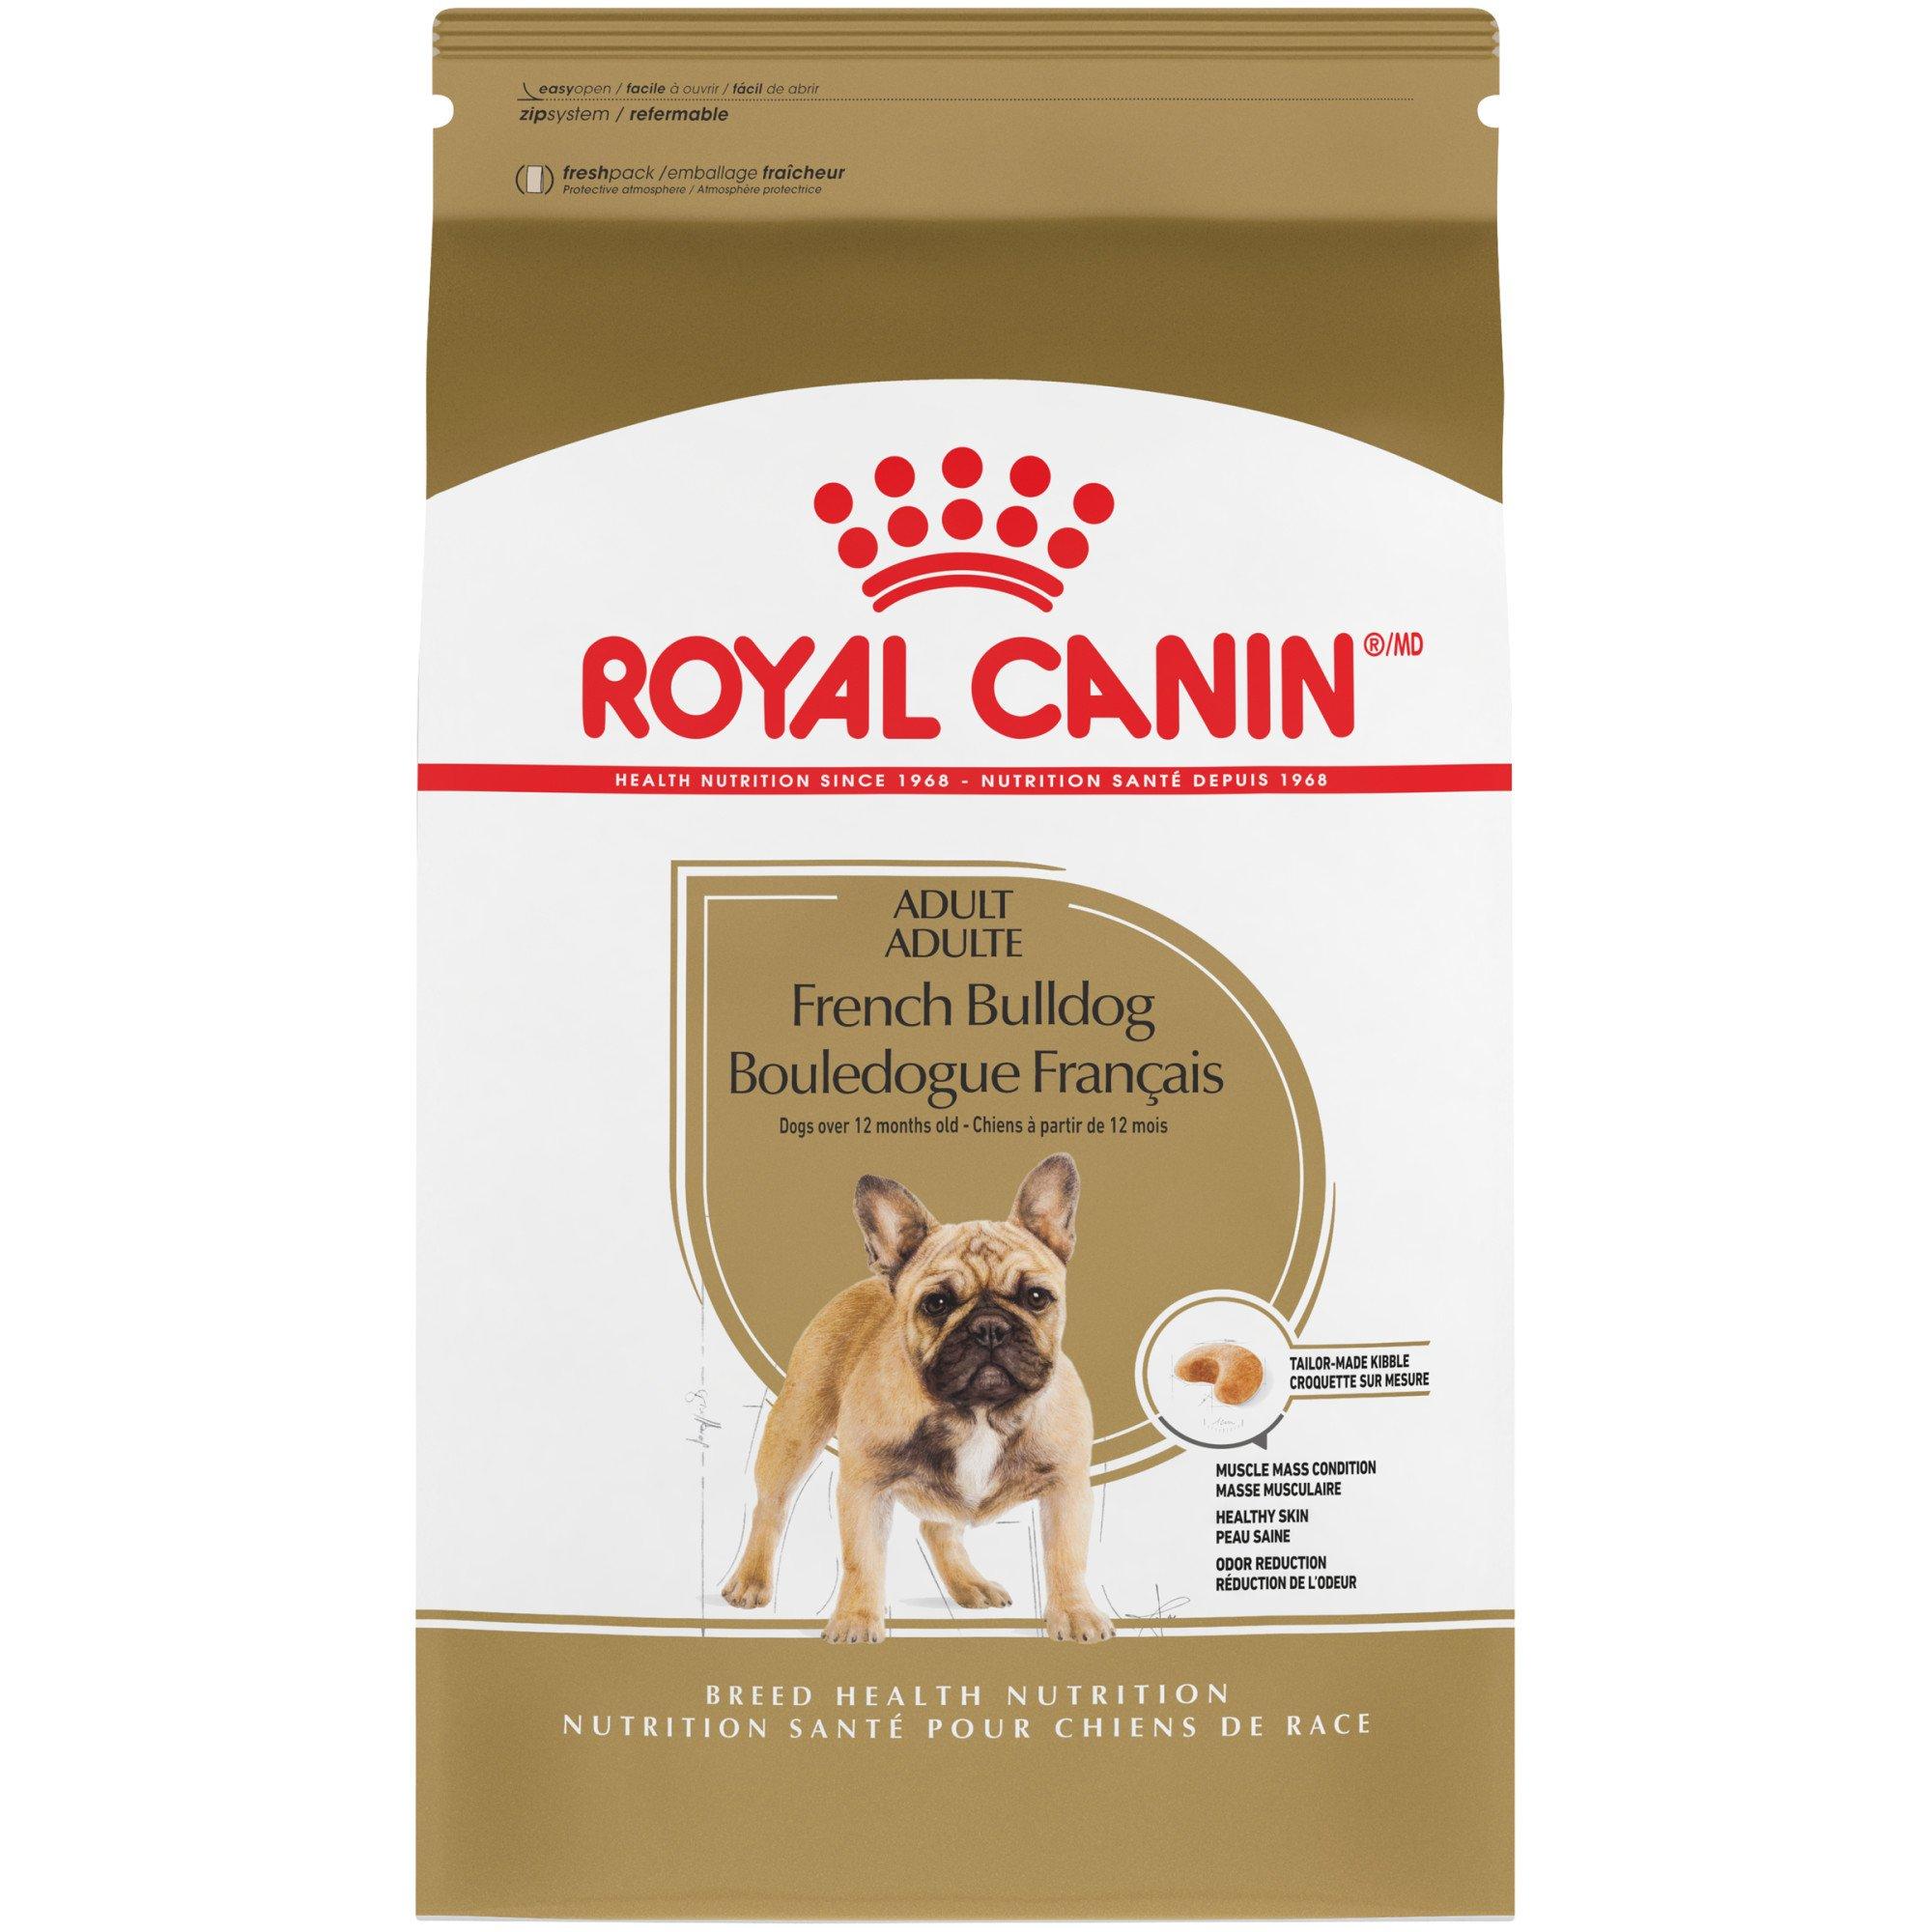 Upc 030111457868 Royal Canin French Bulldog Adult Dry